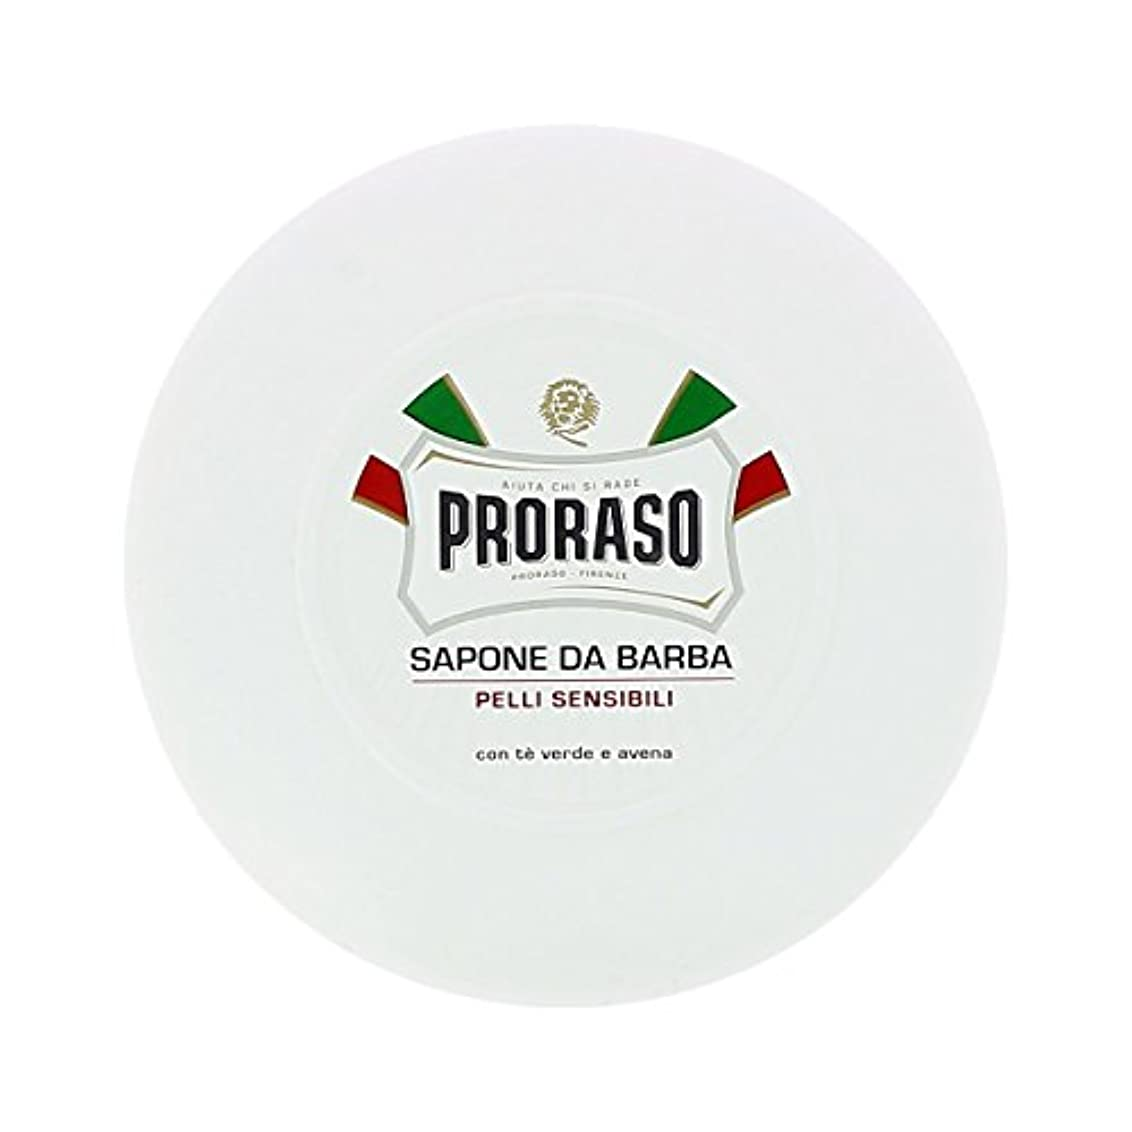 Proraso イタリアン センシティブシェービングソープ&ボウル 150ml[海外直送品] [並行輸入品]